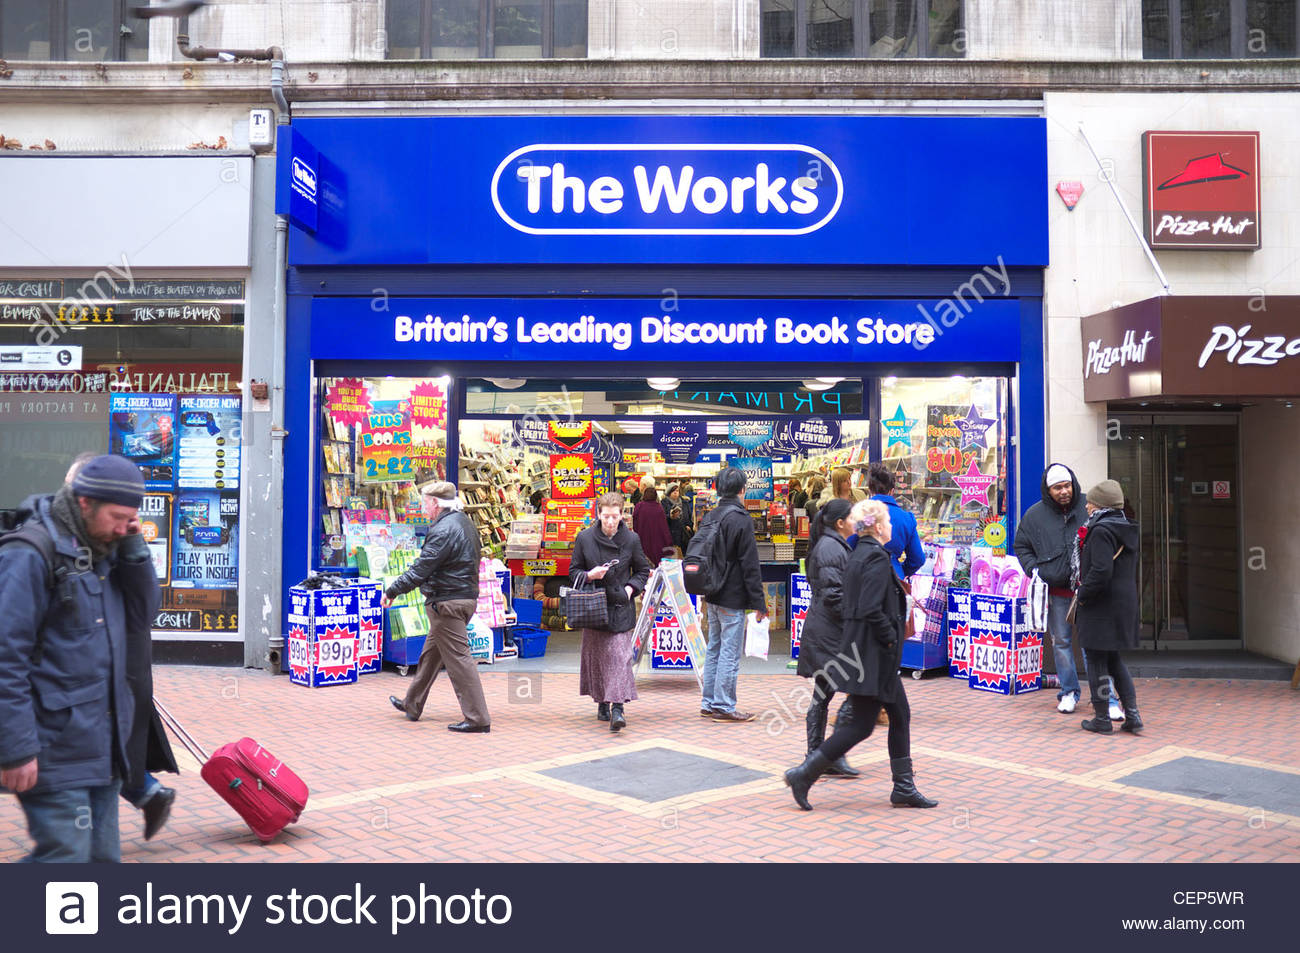 the-works-discount-book-chain-store-new-street-birmingham-uk-CEP5WR.jpg